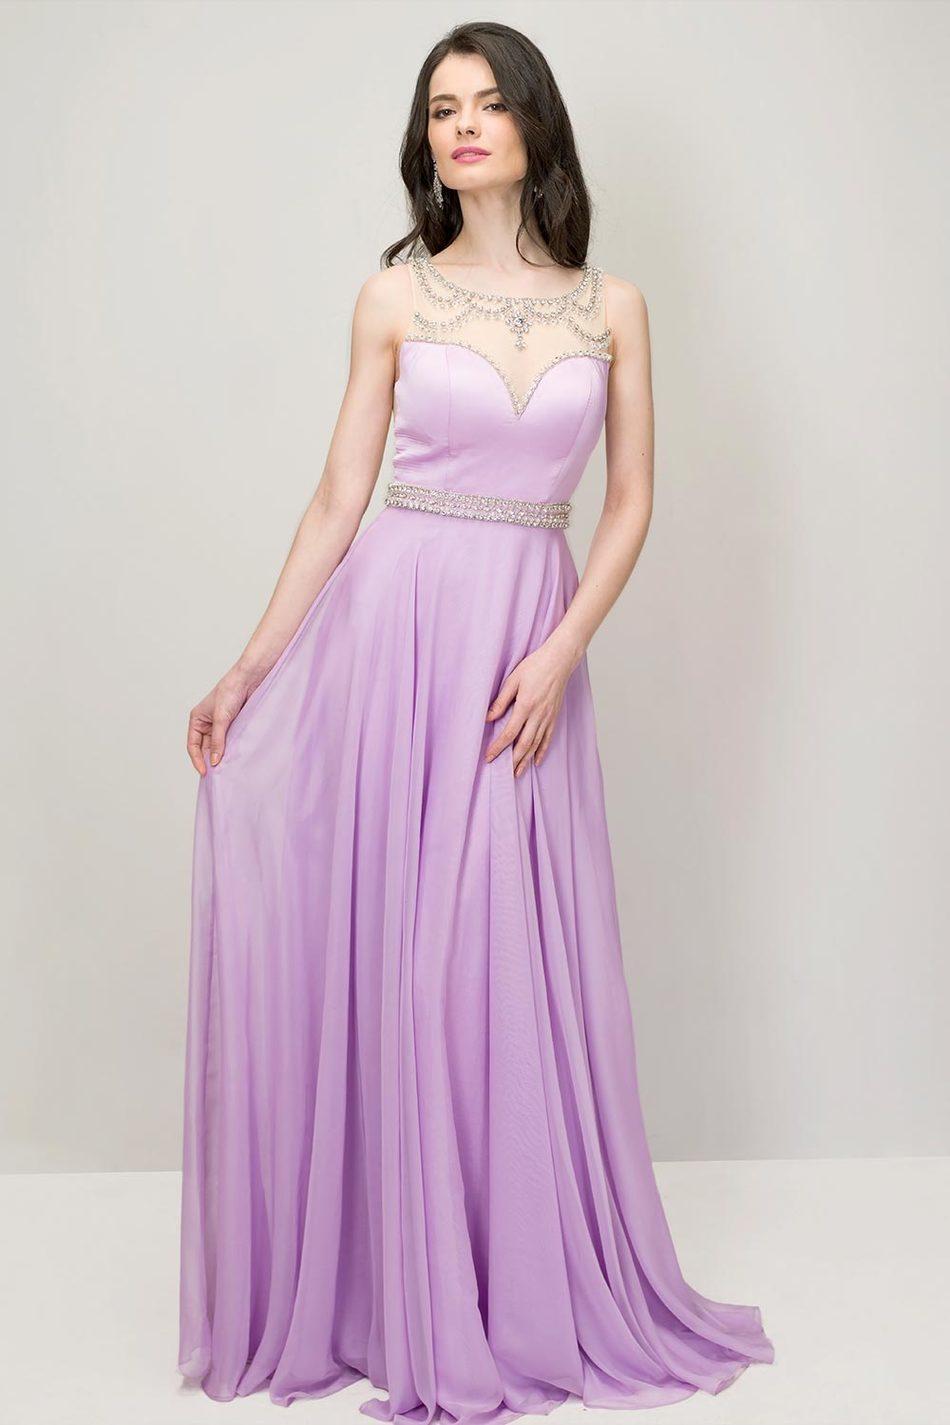 Popular Lilac Chiffon Prom Dress-Buy Cheap Lilac Chiffon Prom ...